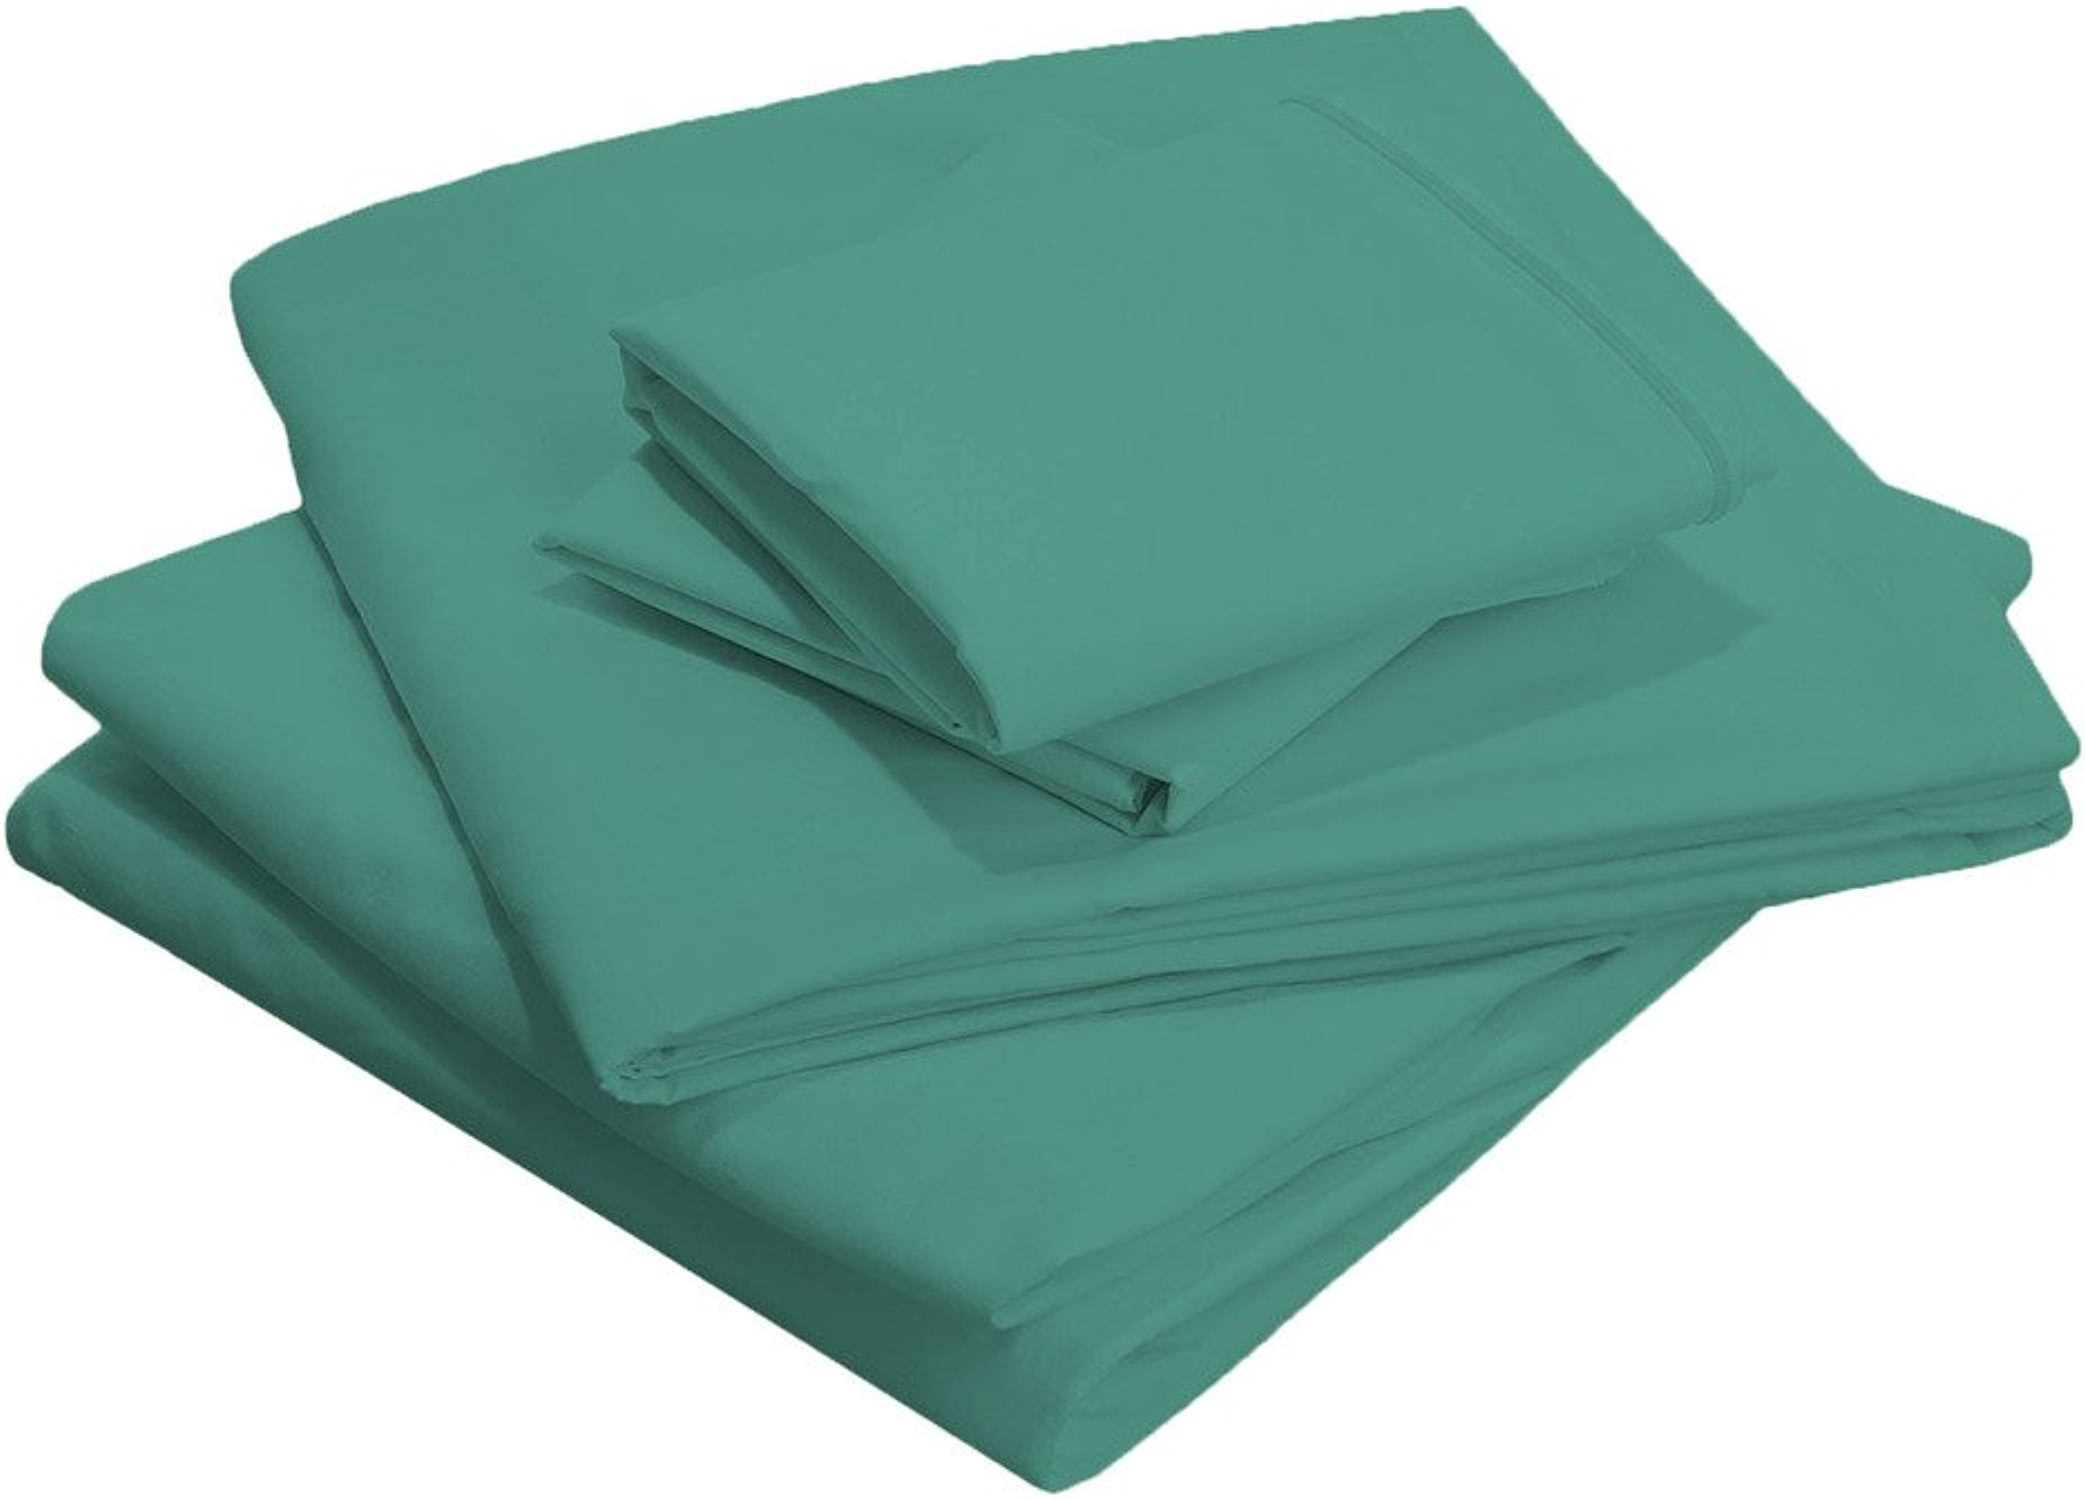 Scala Bedding fils 600, 100% coton égypcravaten, pleine Taille  XXL, Deep Pocket Sheet Set, cyan